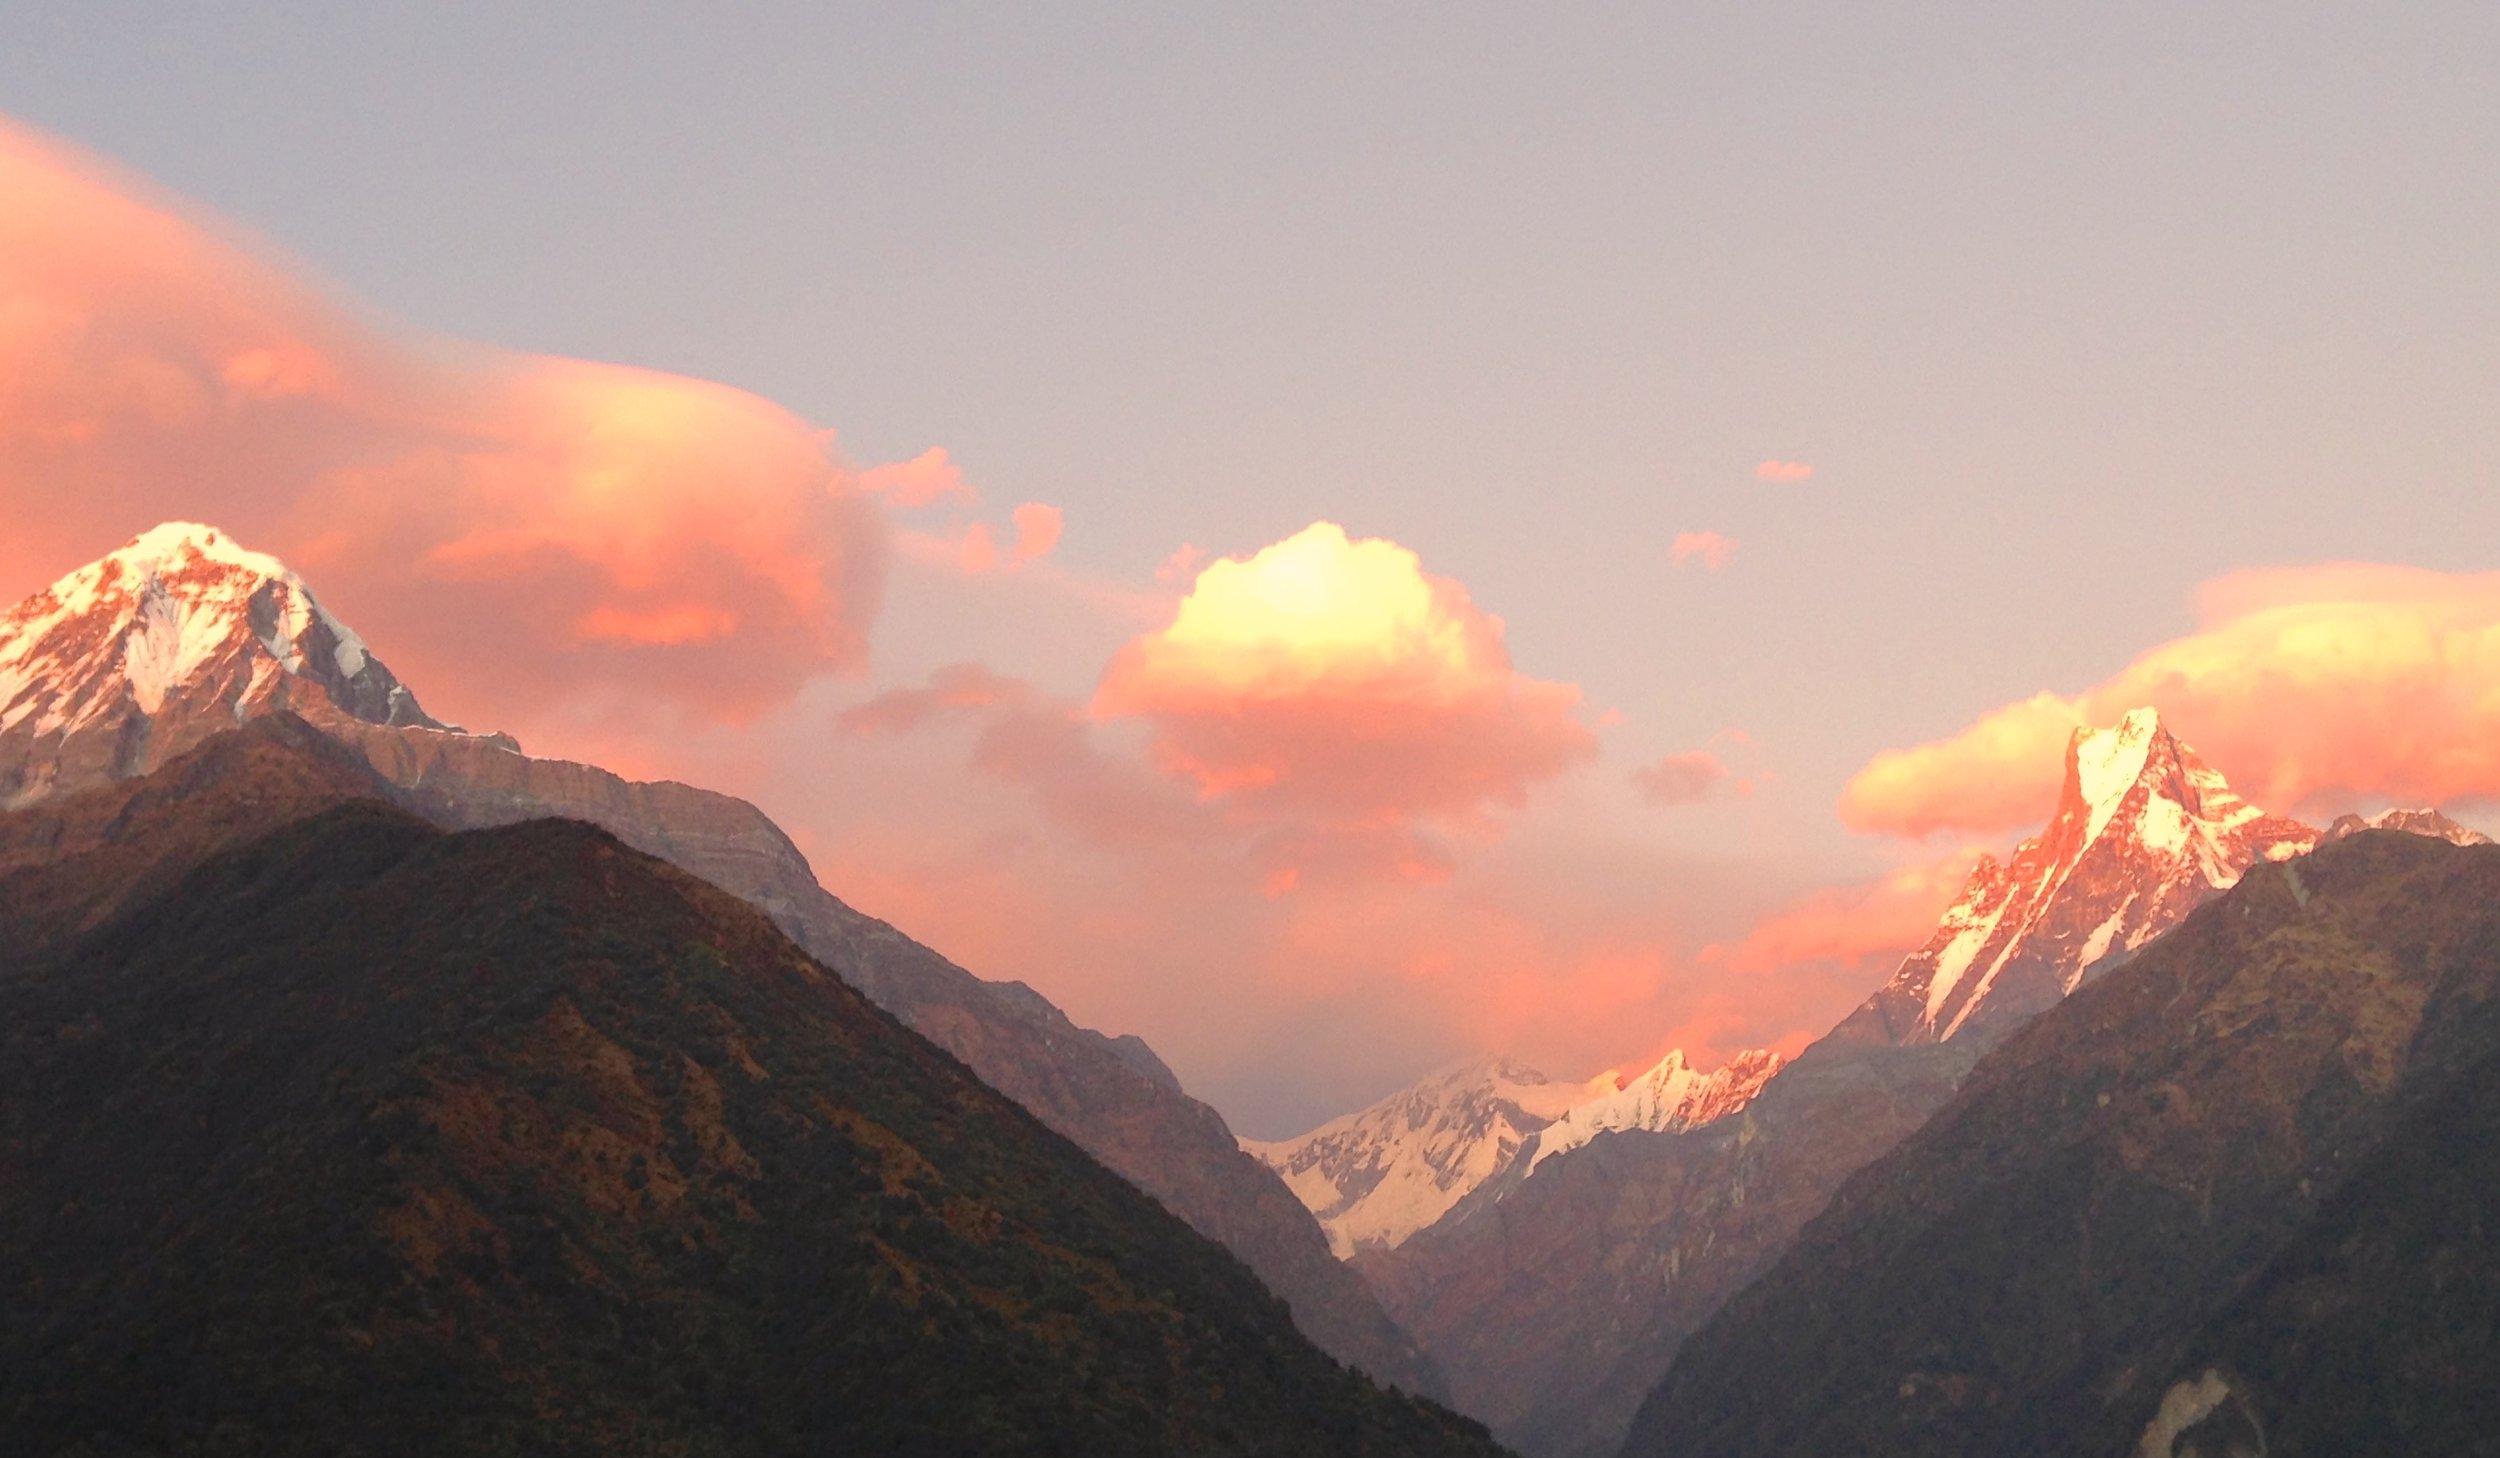 """Shiva's Way"" © November 2012  mariannenishifué.com  Machapuchare Annapurna South Trail"